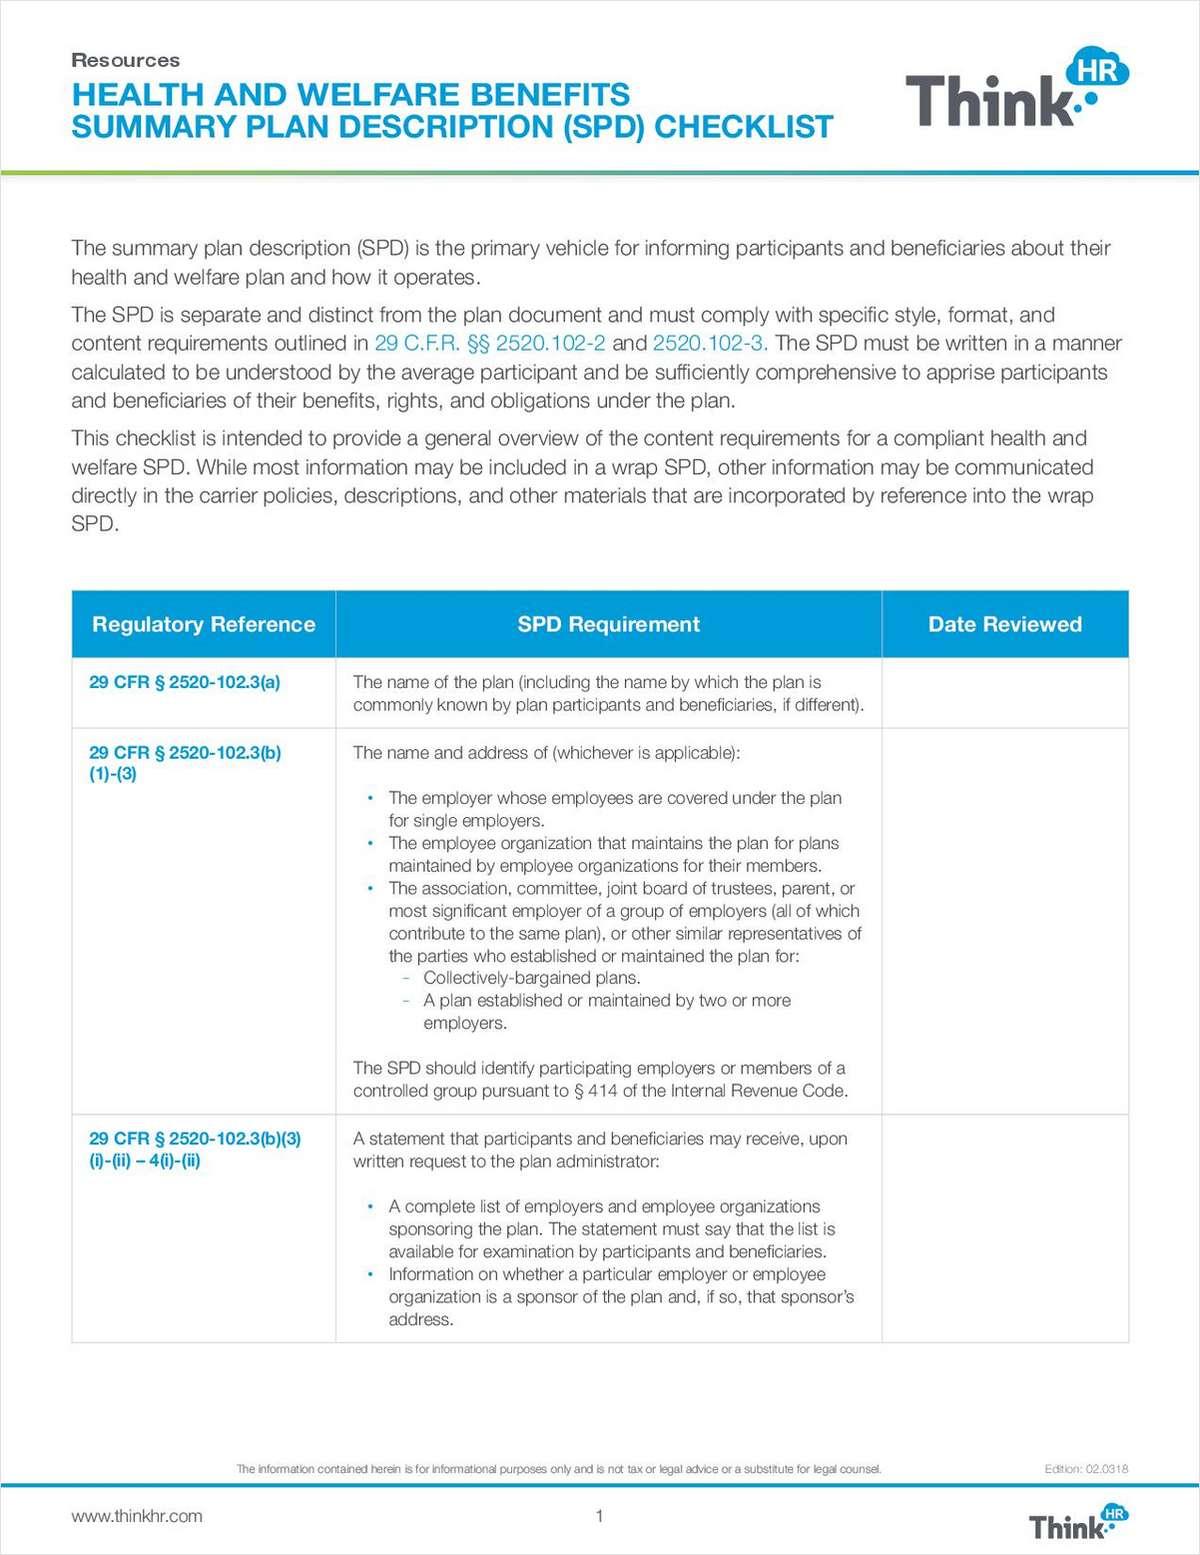 Health and Welfare Benefits Summary Plan Description (SPD) Checklist